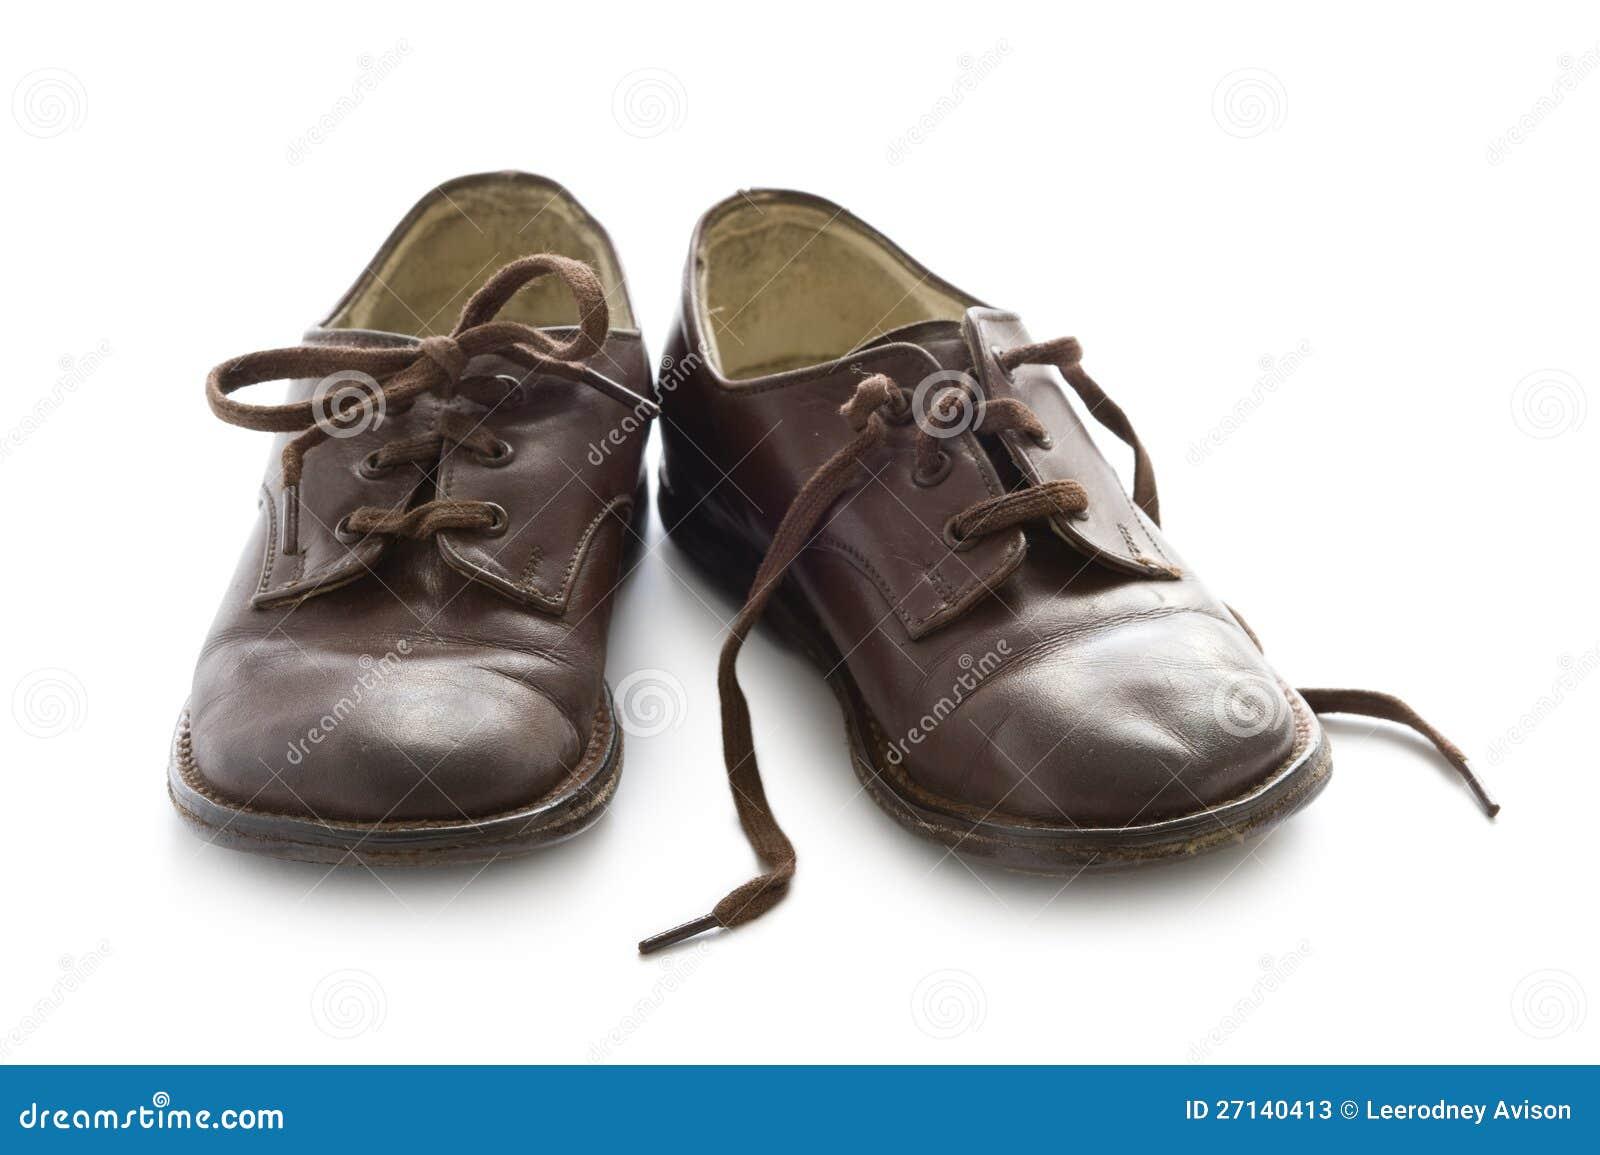 Old School Shoes: Vintage Shoes For Children